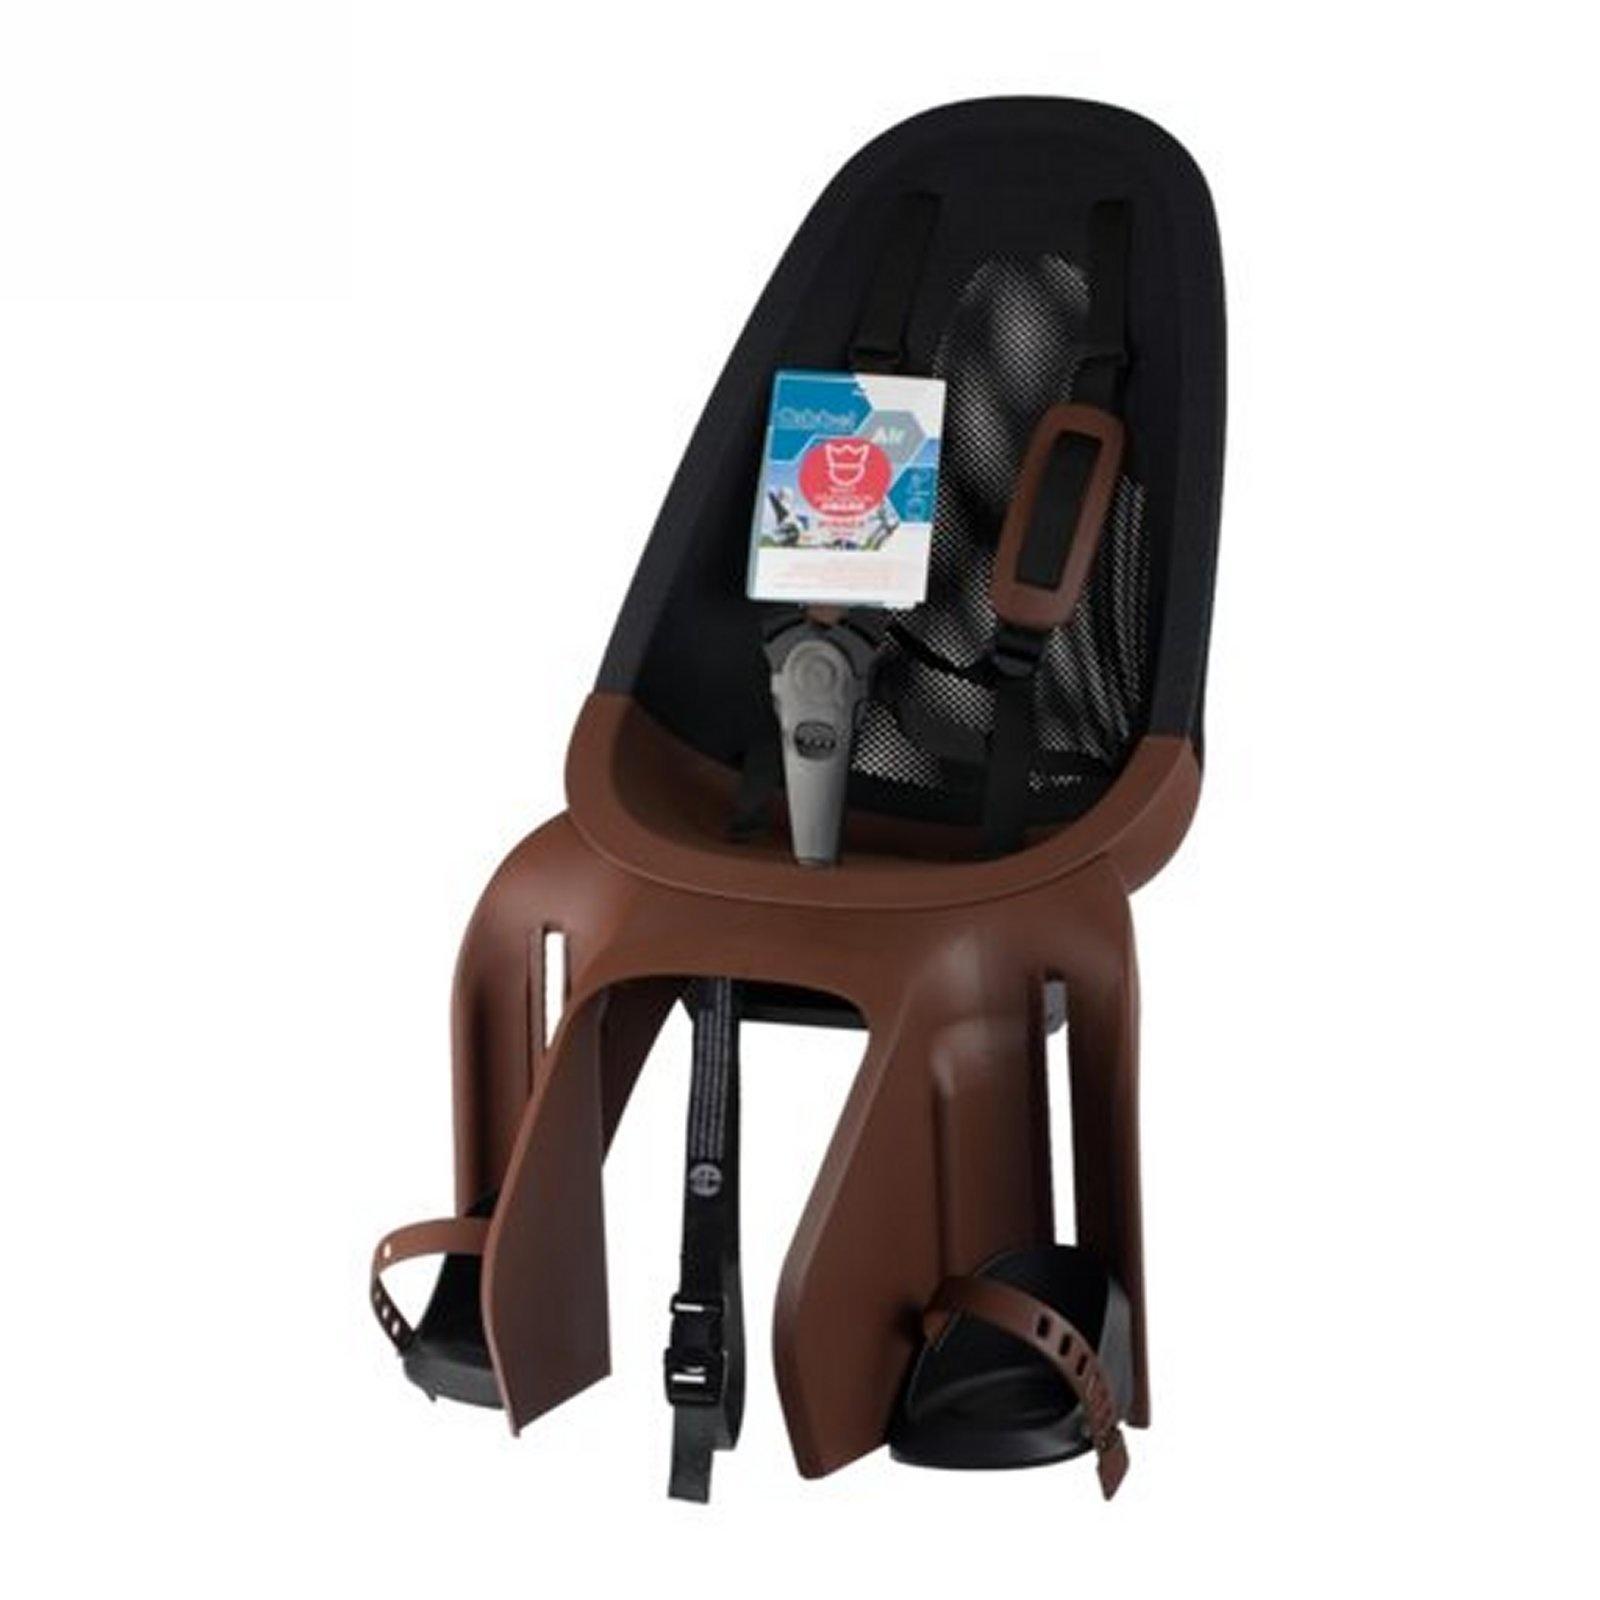 Air achterstoeltje drager bevestiging bruin